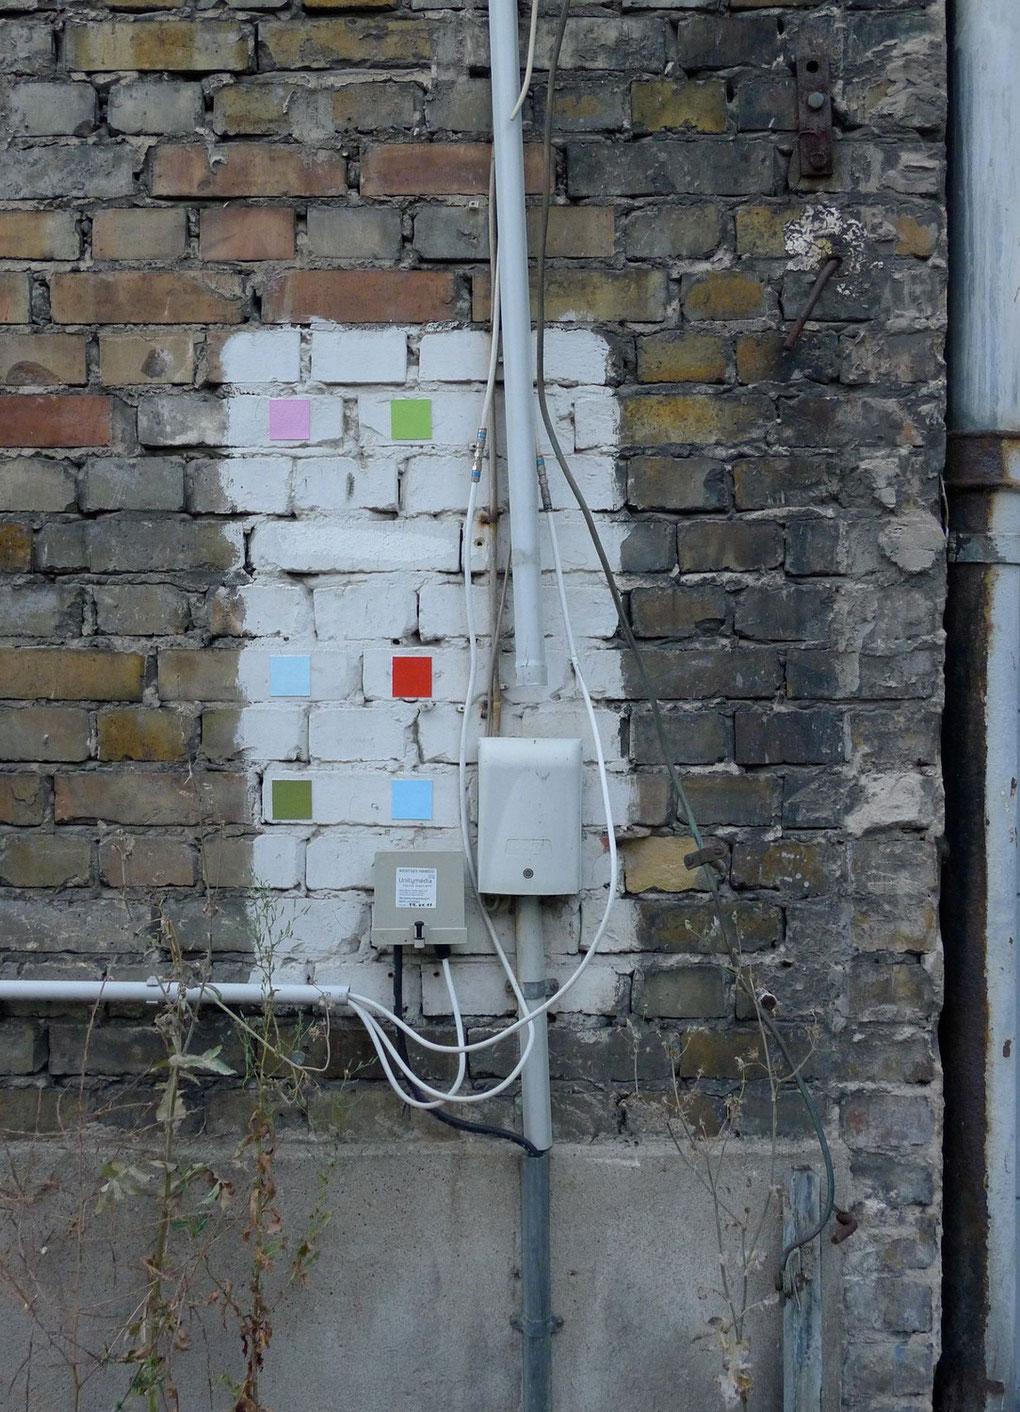 LA LA LA LA, 2013, Malerei auf Leinwand, 6 Quadrate, je 5 x 5 cm, Lippstadt, Fleischhauerstraße